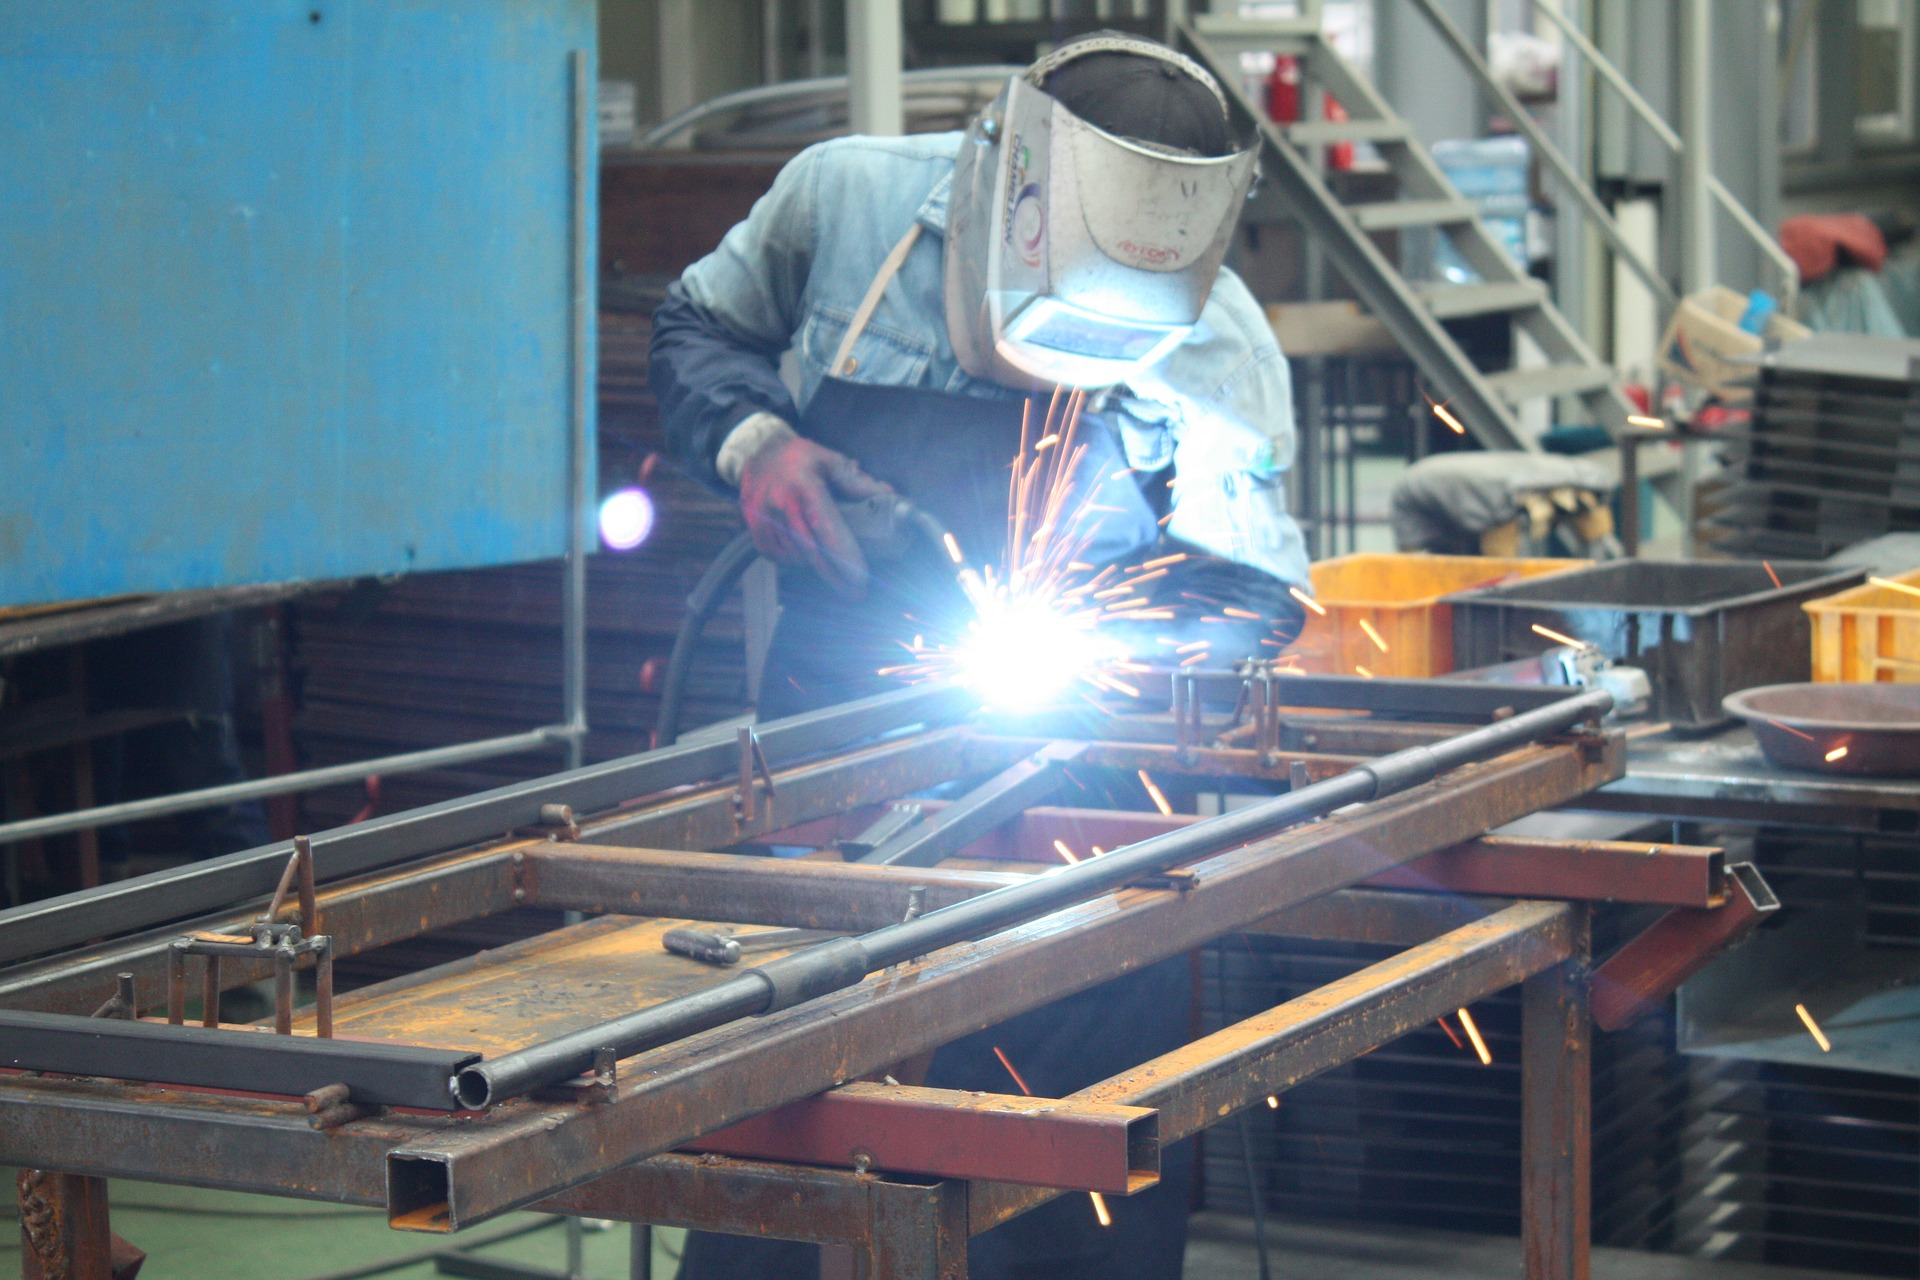 Actividad económica creció 1% en septiembre: Inegi